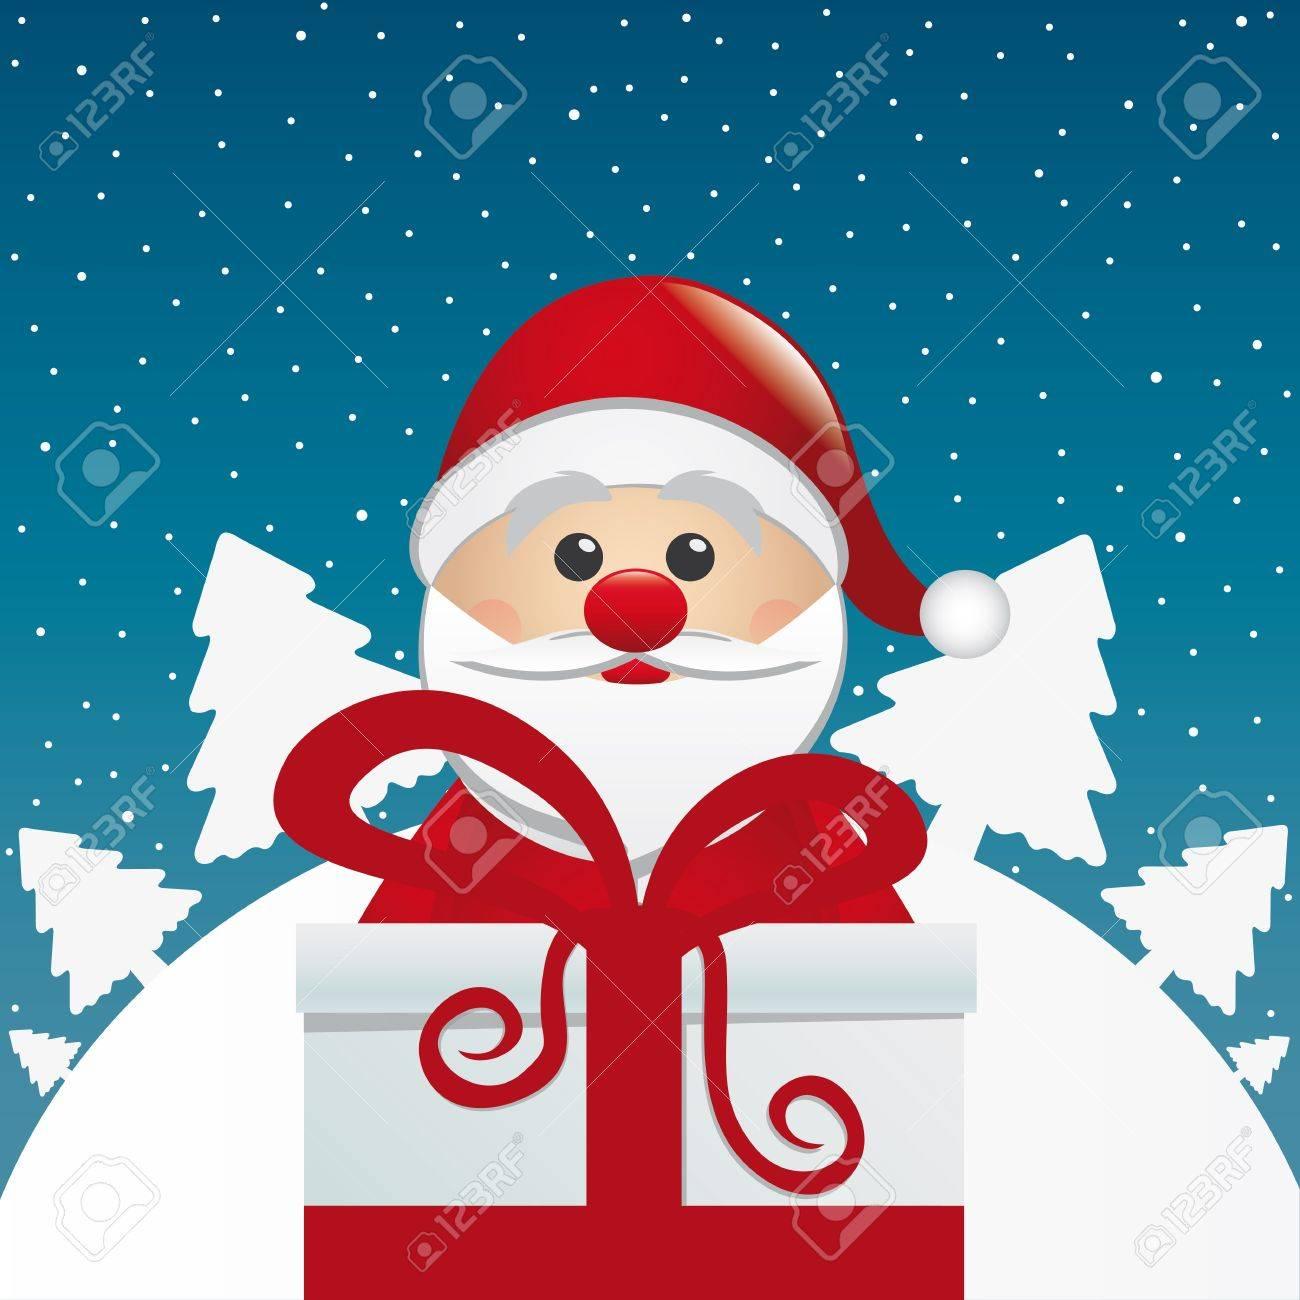 santa behind gift box white winter landscape - 16068190